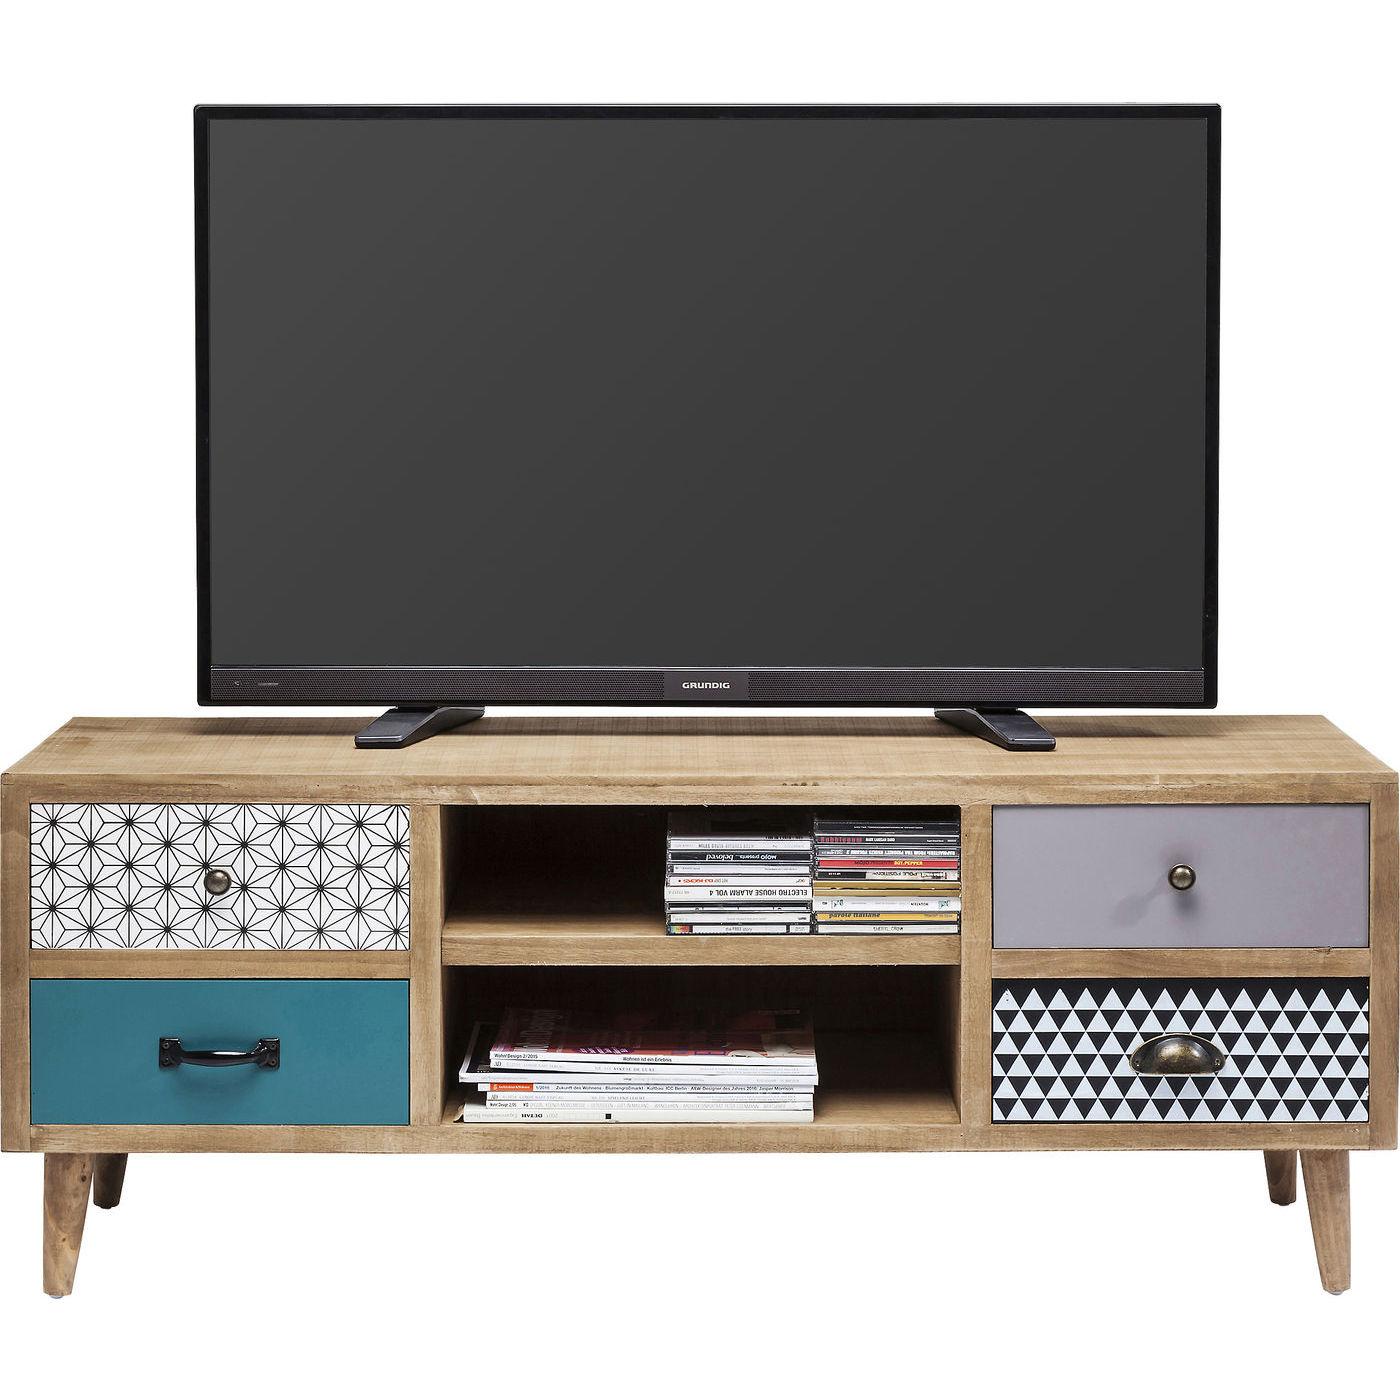 kare design Kare design capri tv-bord - lakeret træ, m. 4 skuffer på boboonline.dk